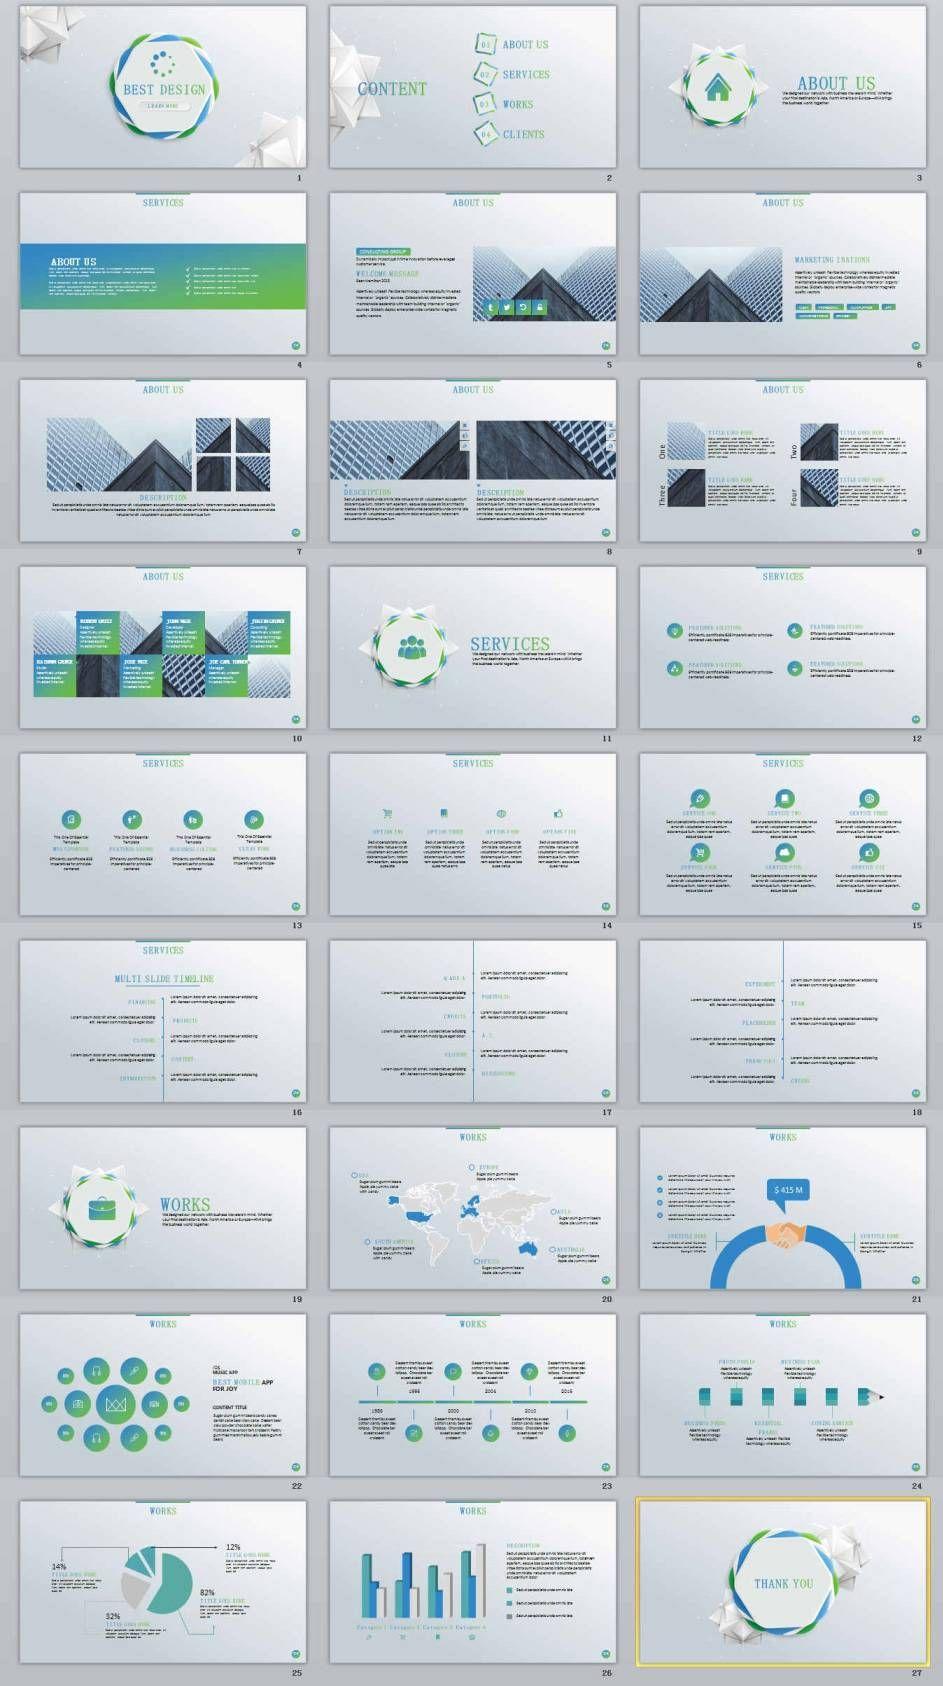 27 multipurpose professional powerpoint templates powerpoint 27 multipurpose professional powerpoint templates powerpoint templates and keynote templates toneelgroepblik Image collections